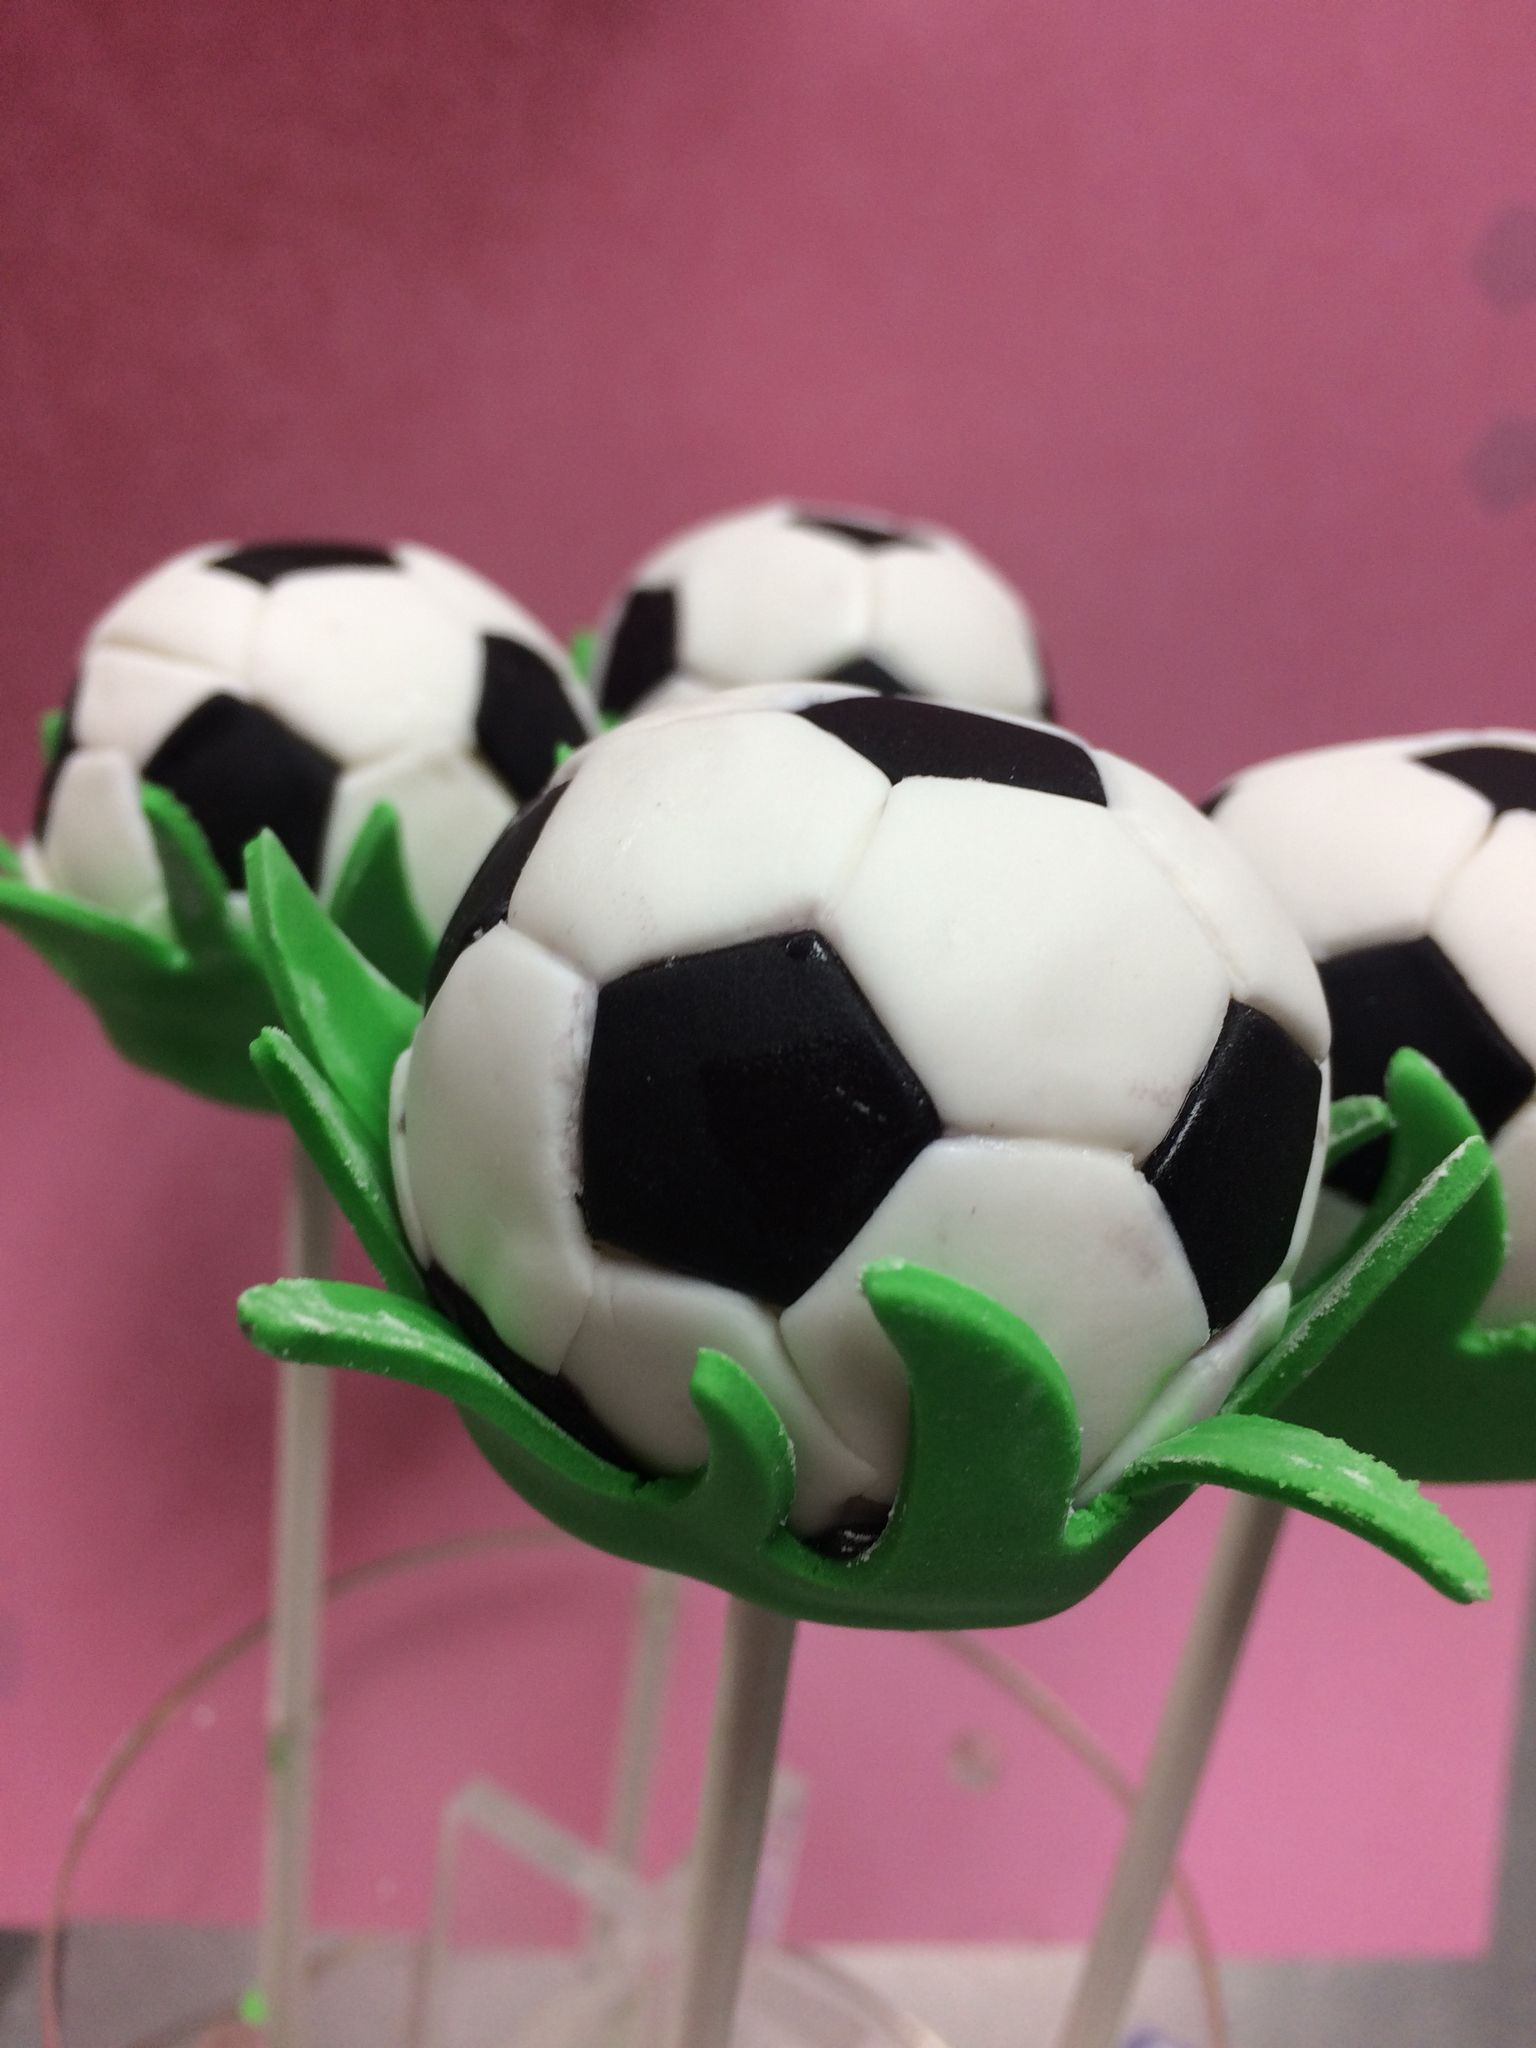 Soccer Cake Pops Soccer Cake Pops Soccer Cake Cake Pop Decorating